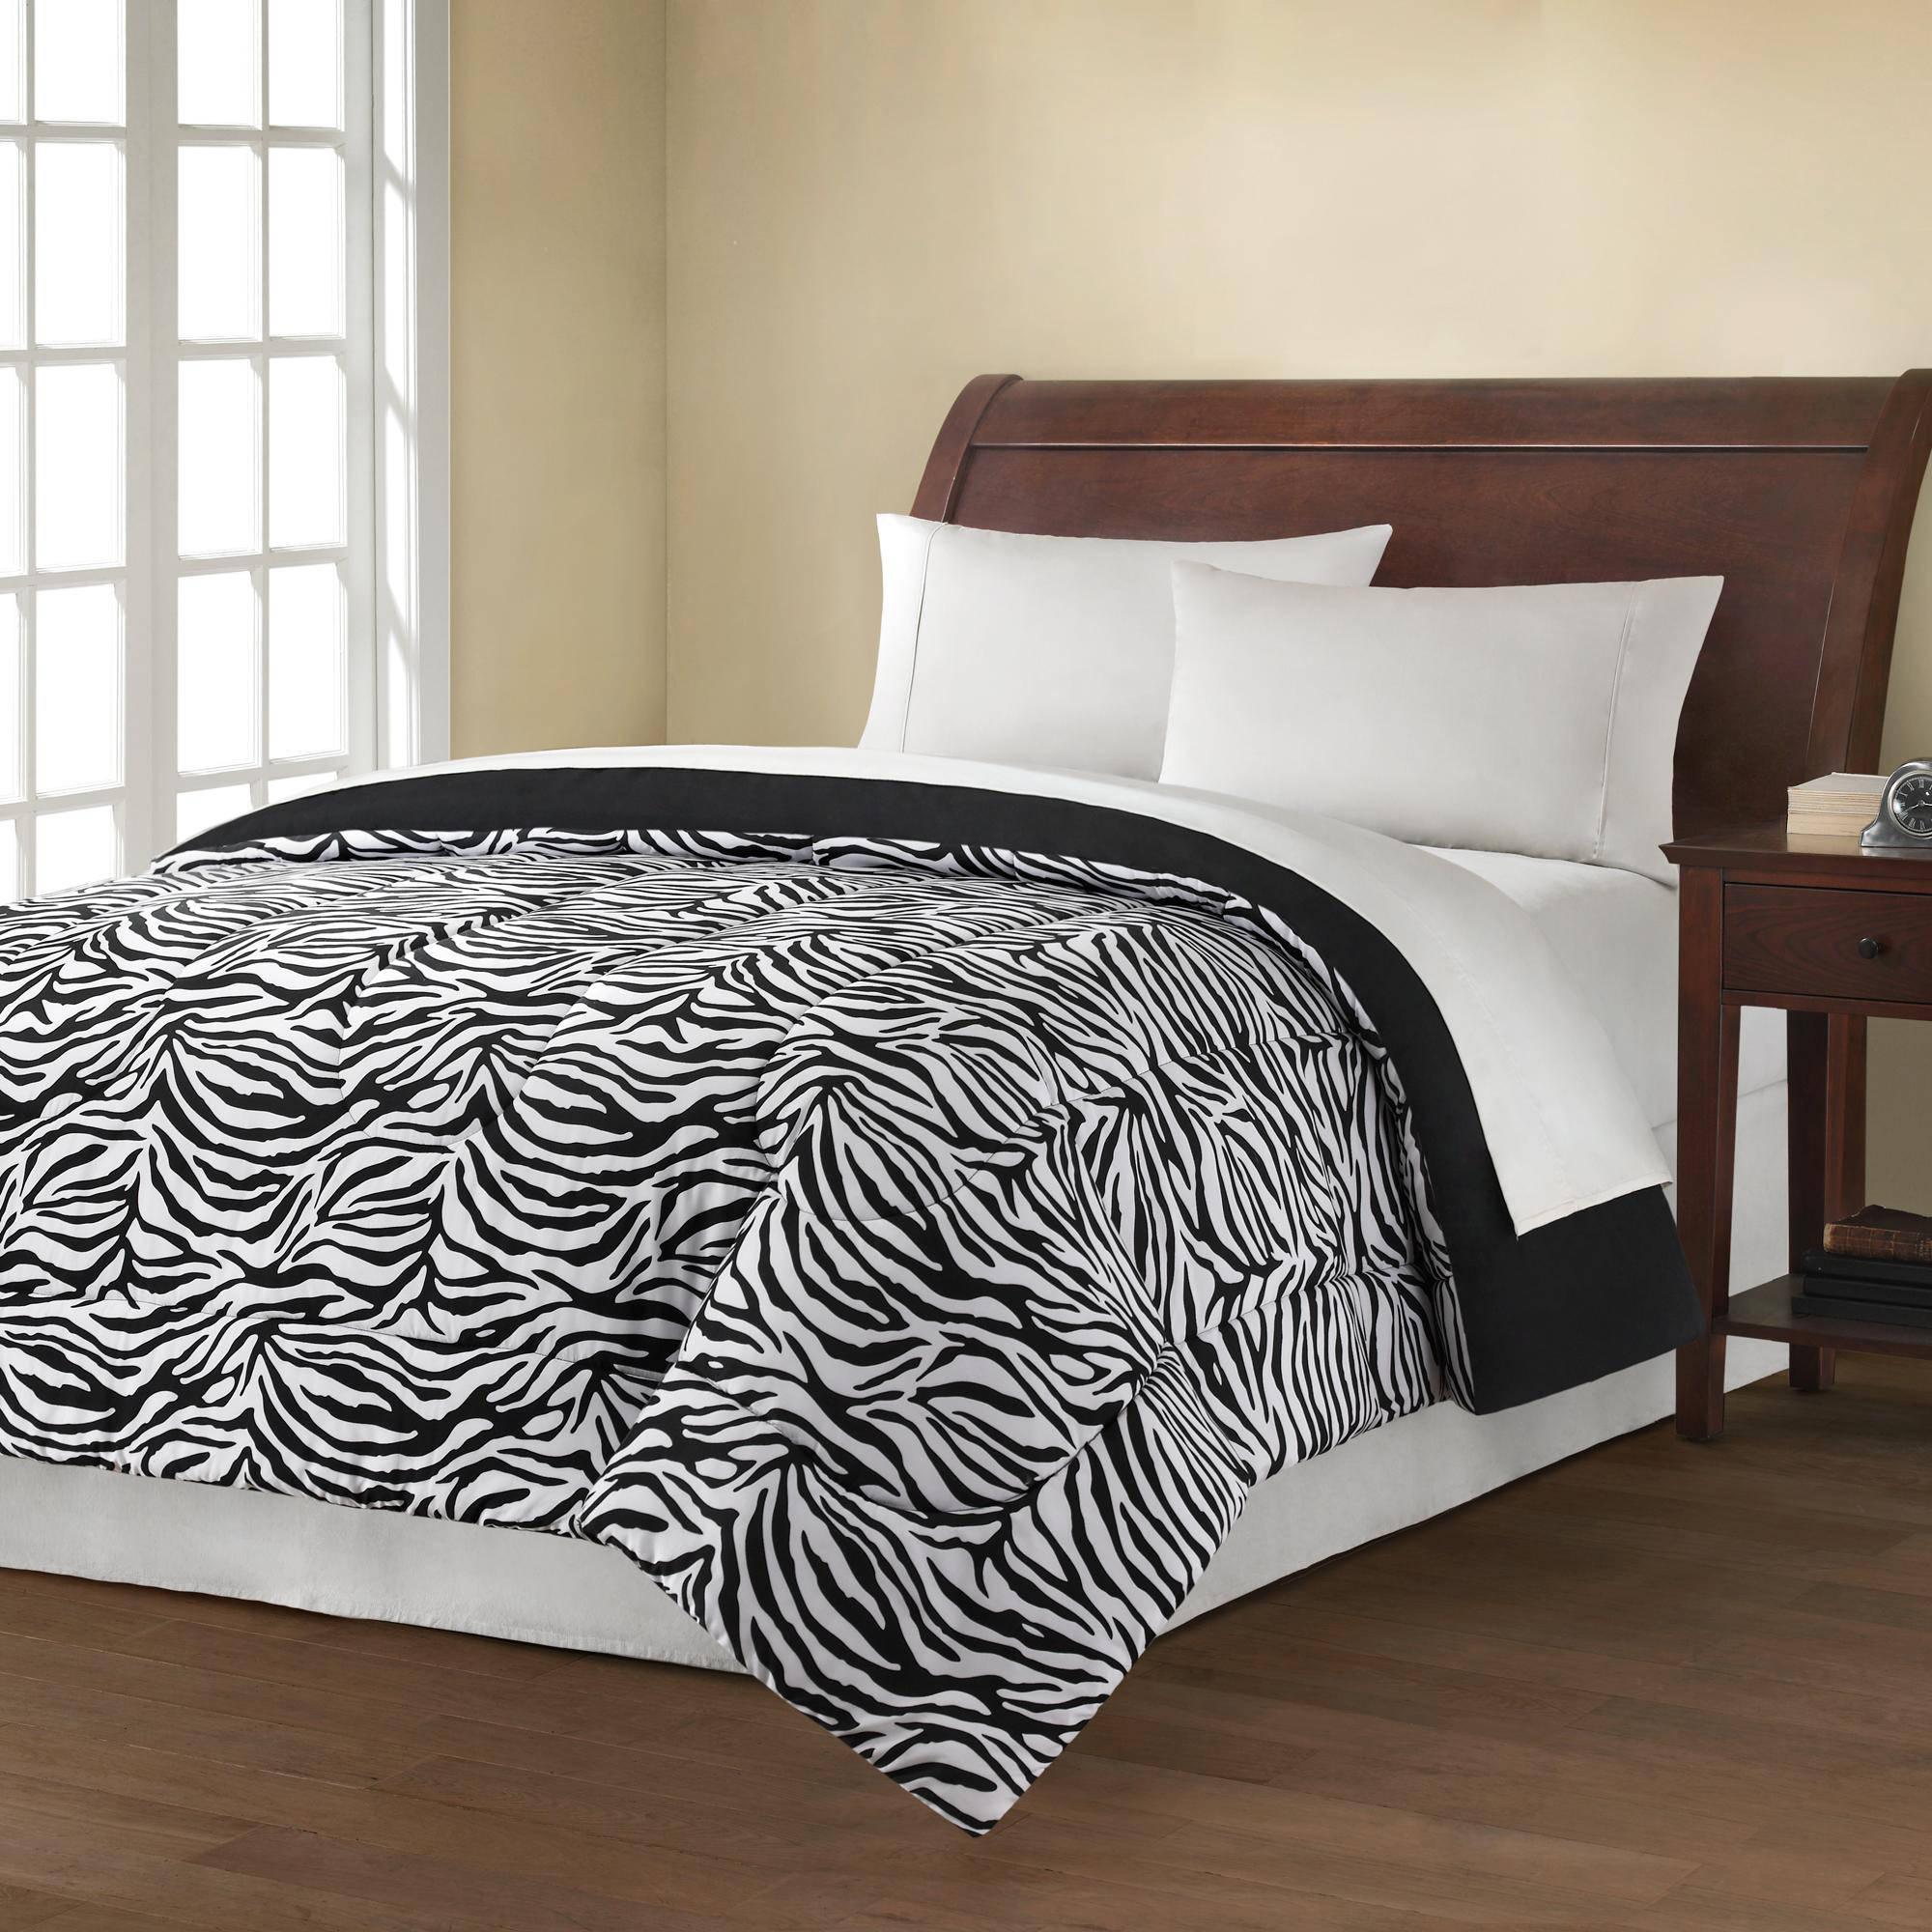 Mainstays Reversible Comforter Collection, Zebra